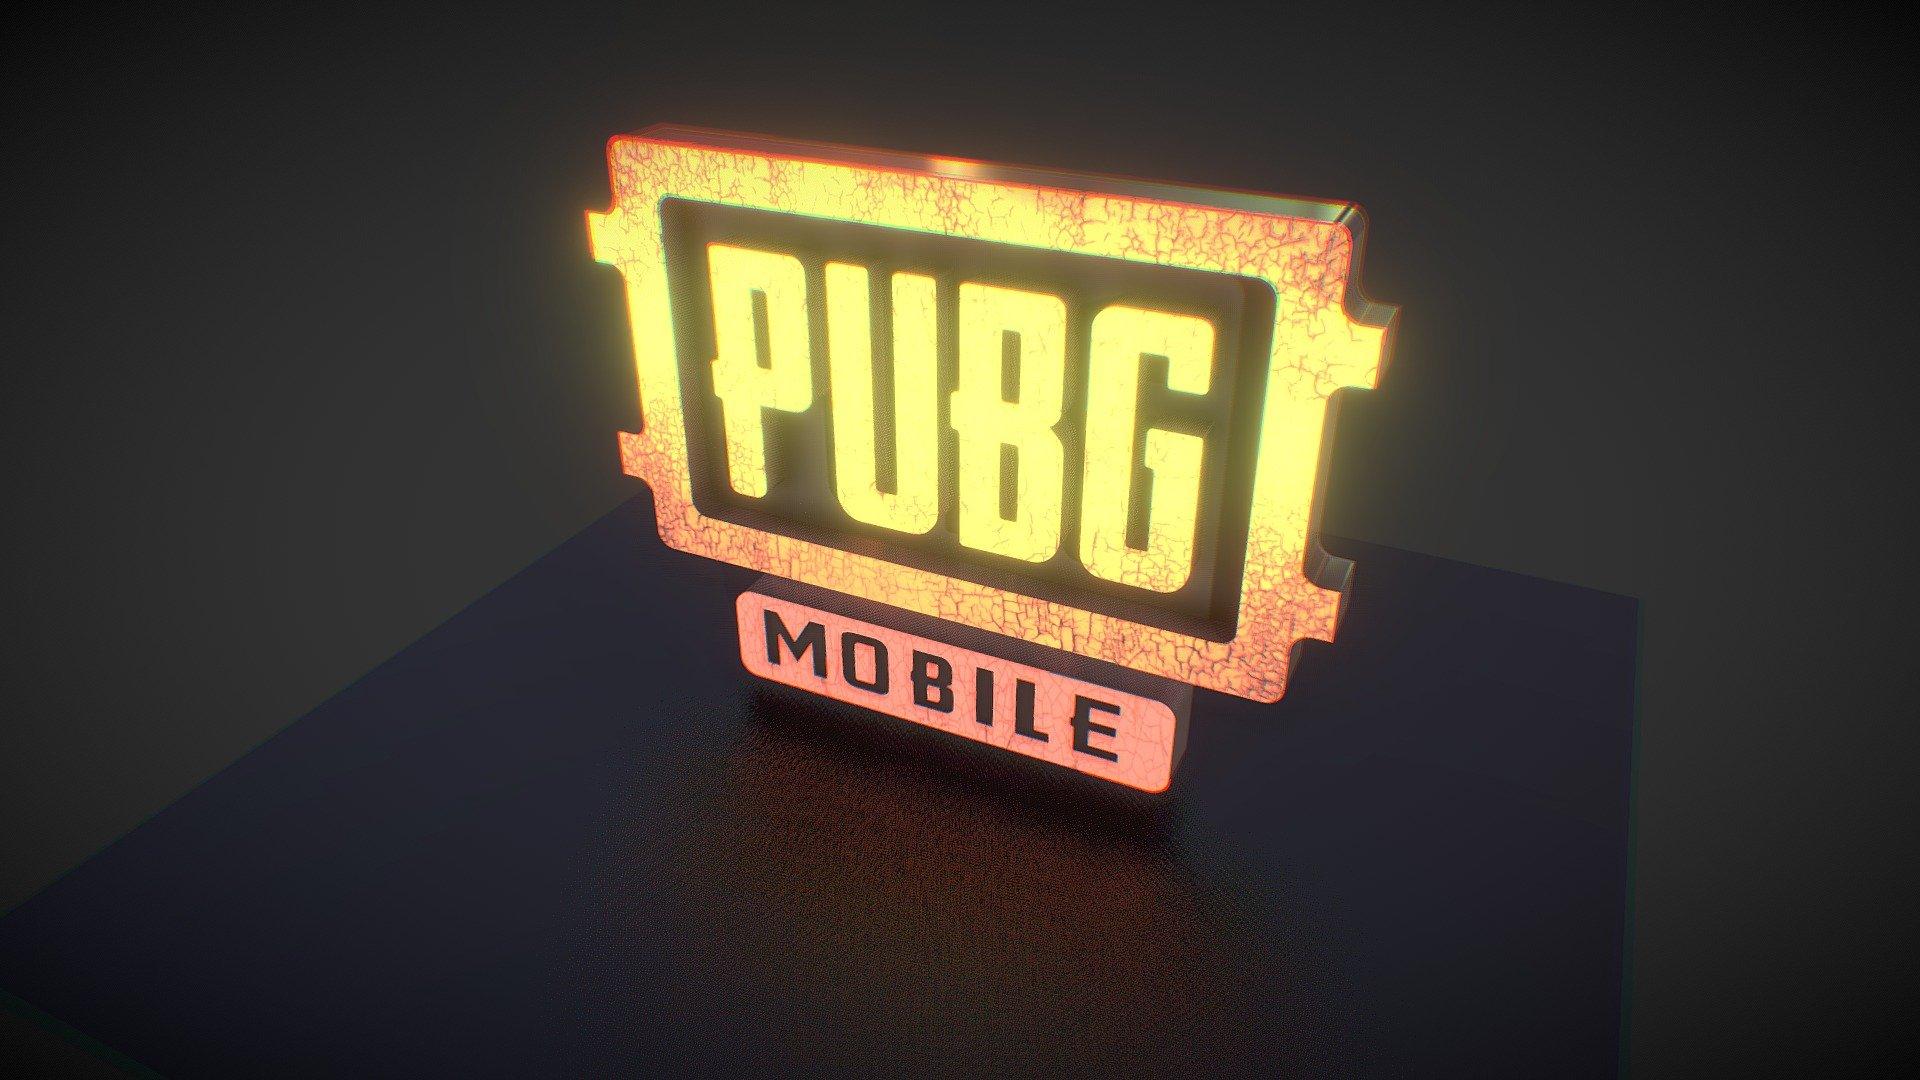 PUBG Mobile Logo Lightbox - Download Free 3D model by ...